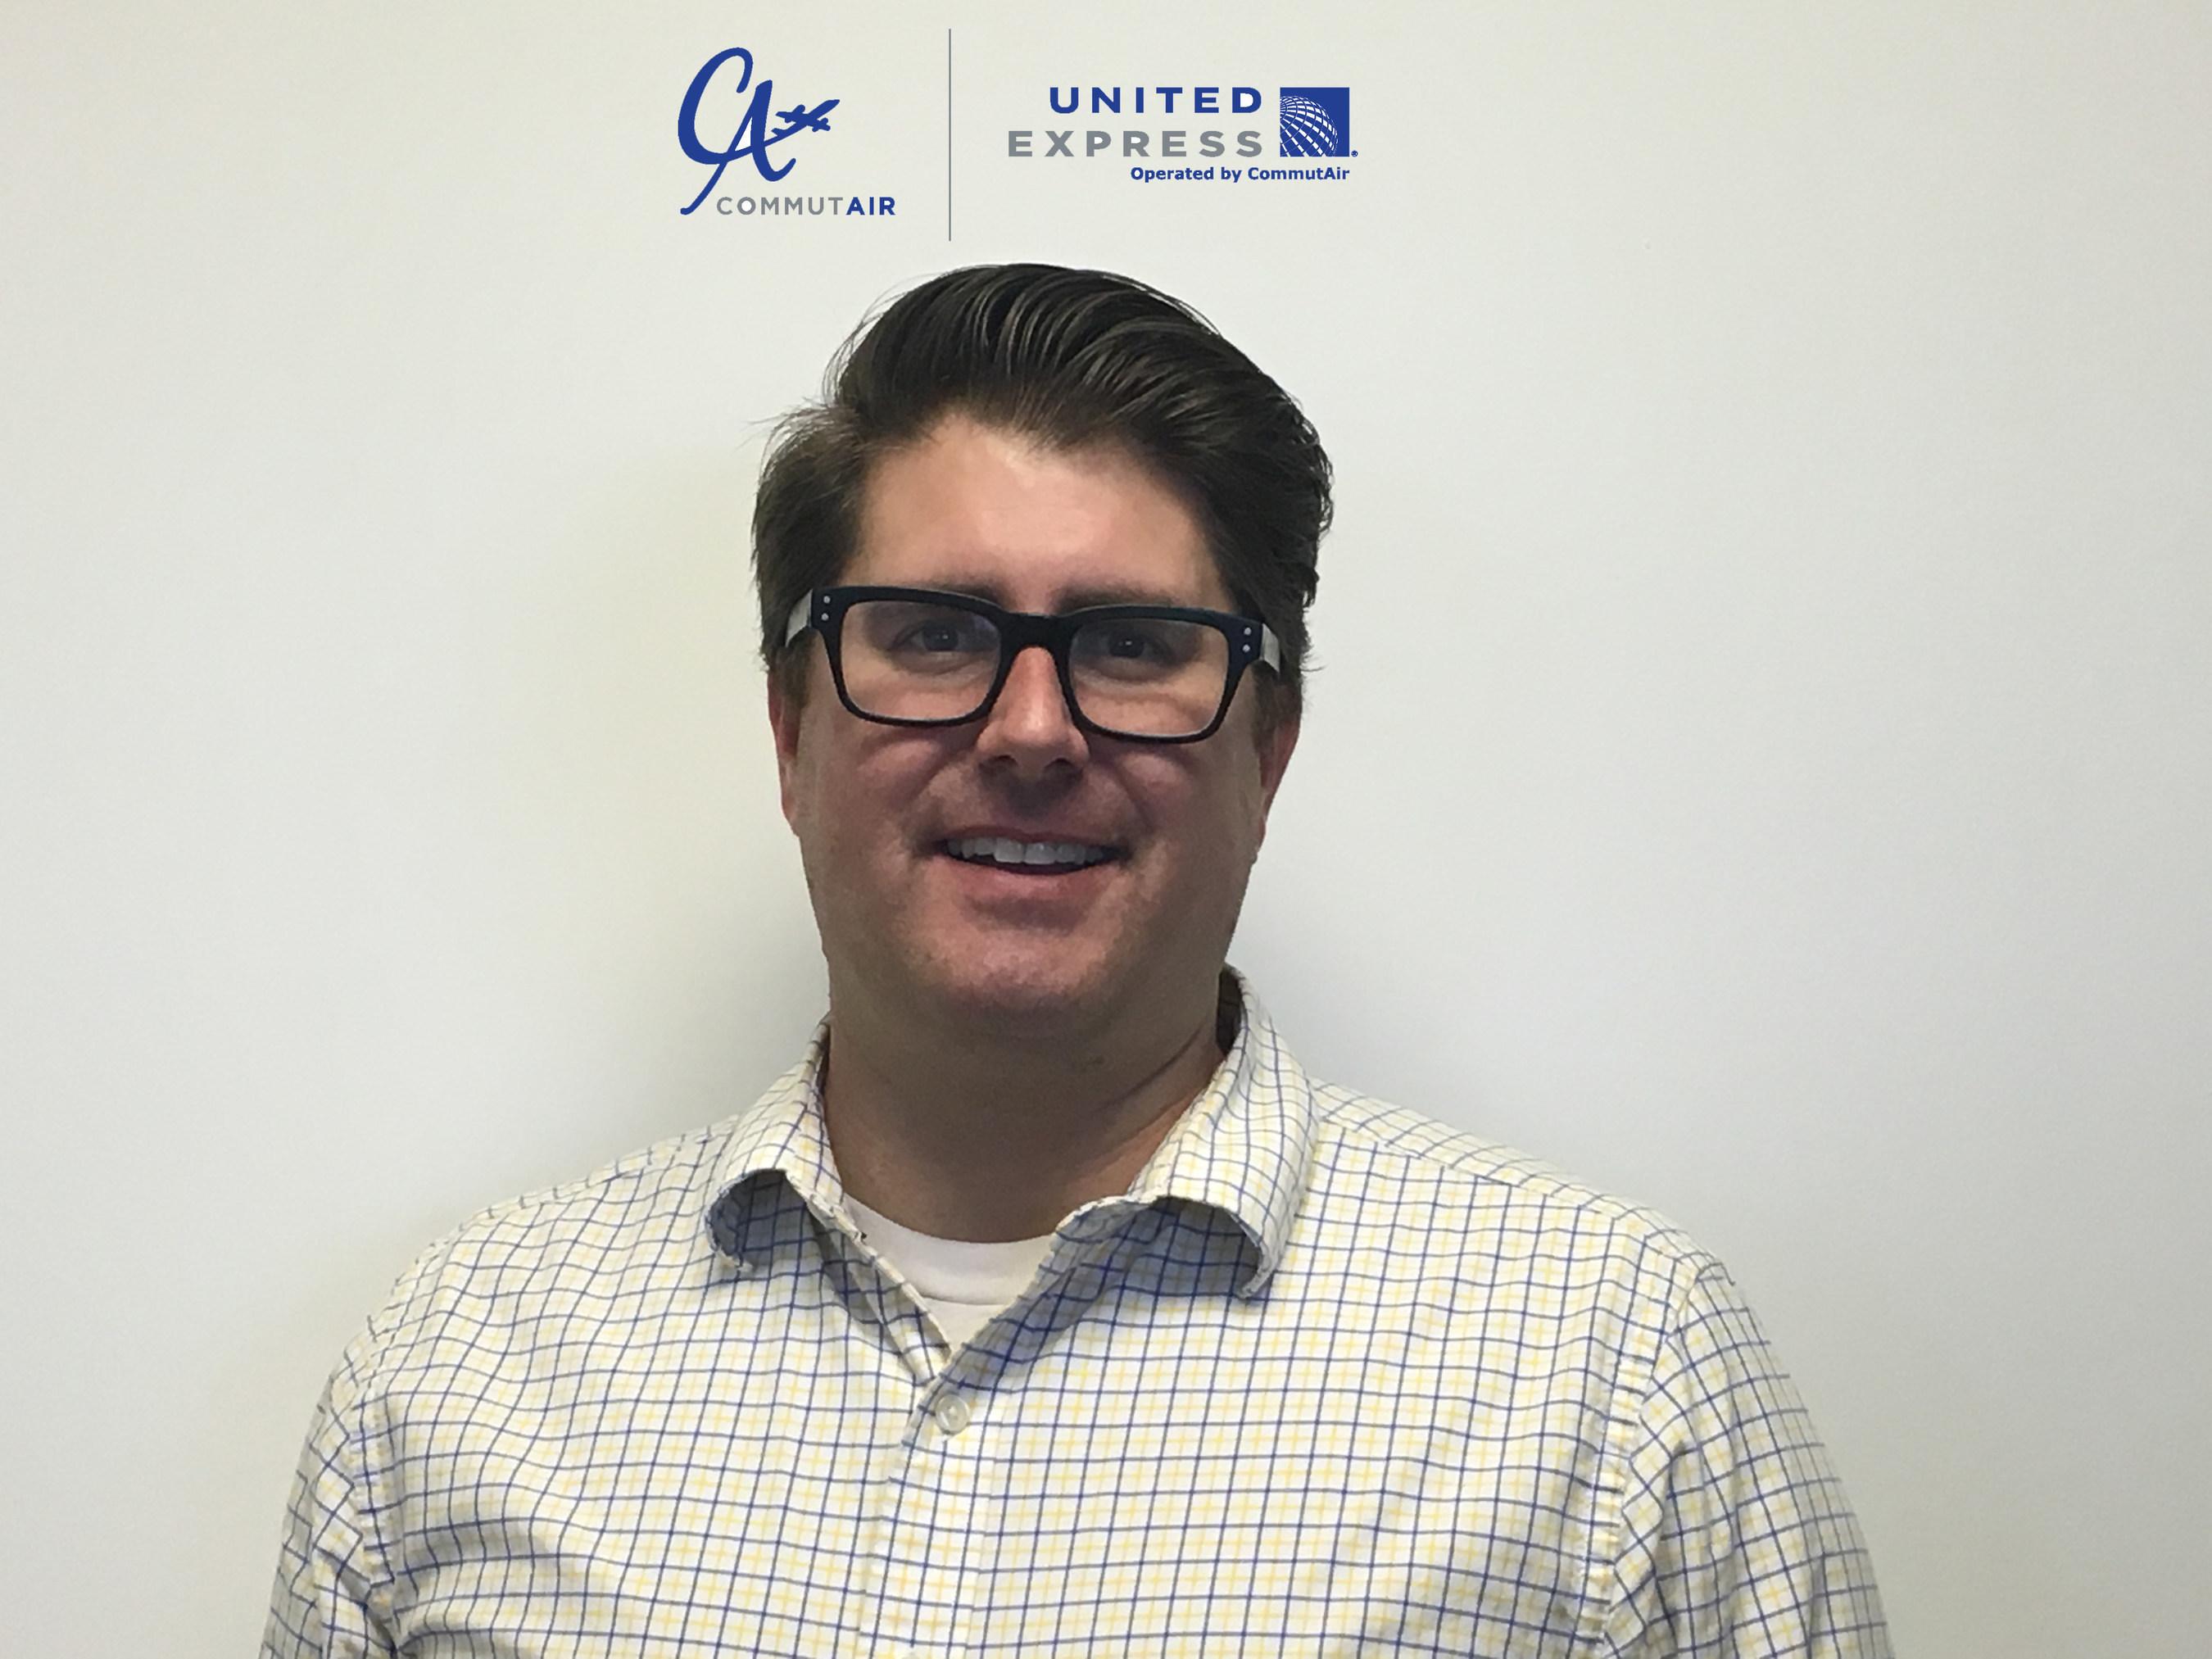 David Petris, Director of SOC and Dispatch